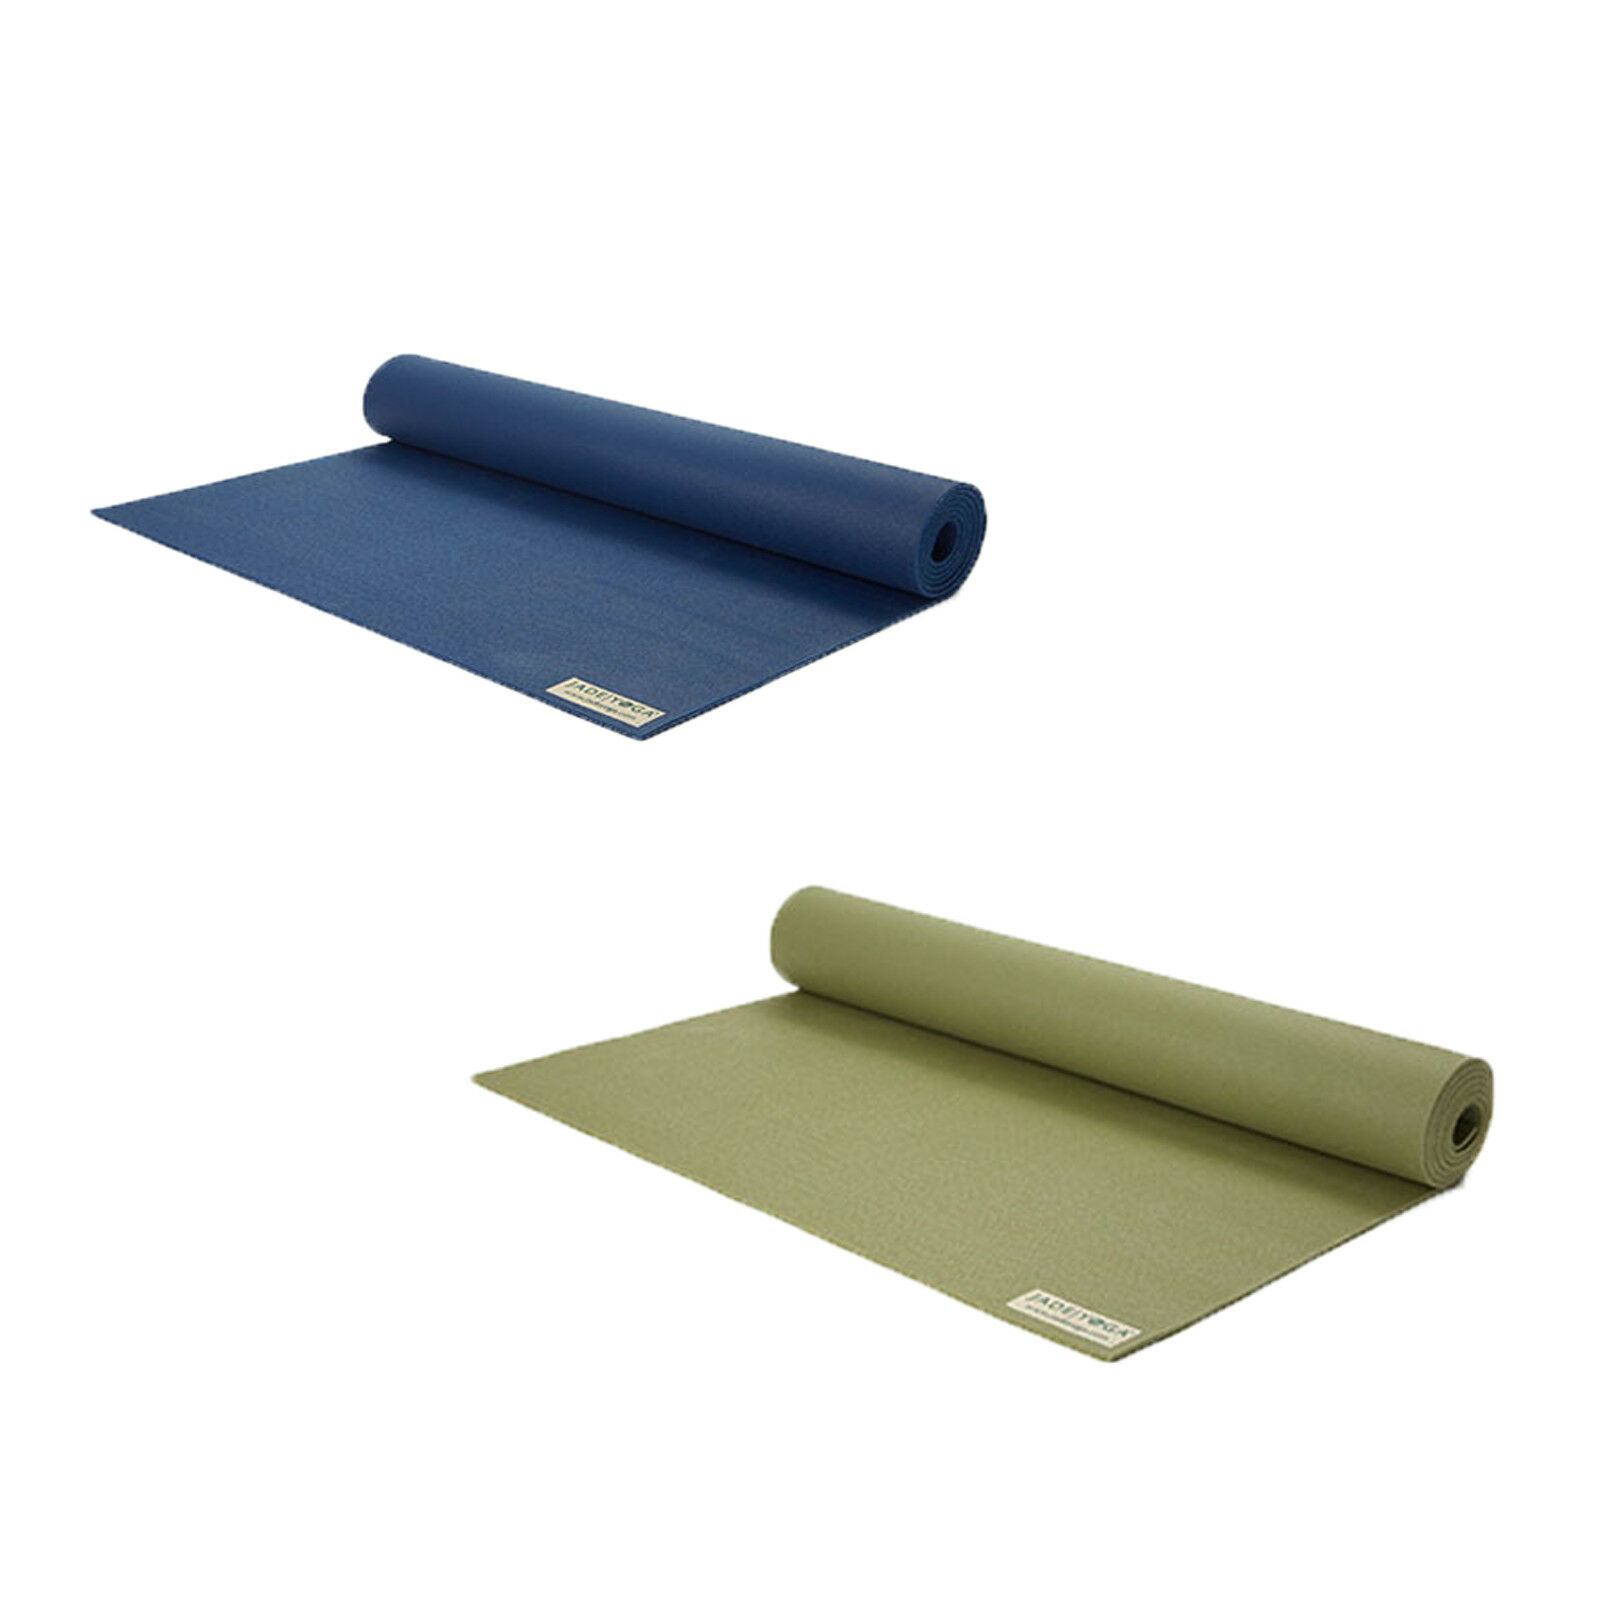 Jade Yoga Harmony Extra Wide Eco Friendly Yoga Pilates Exercise Fitness Mat 5mm